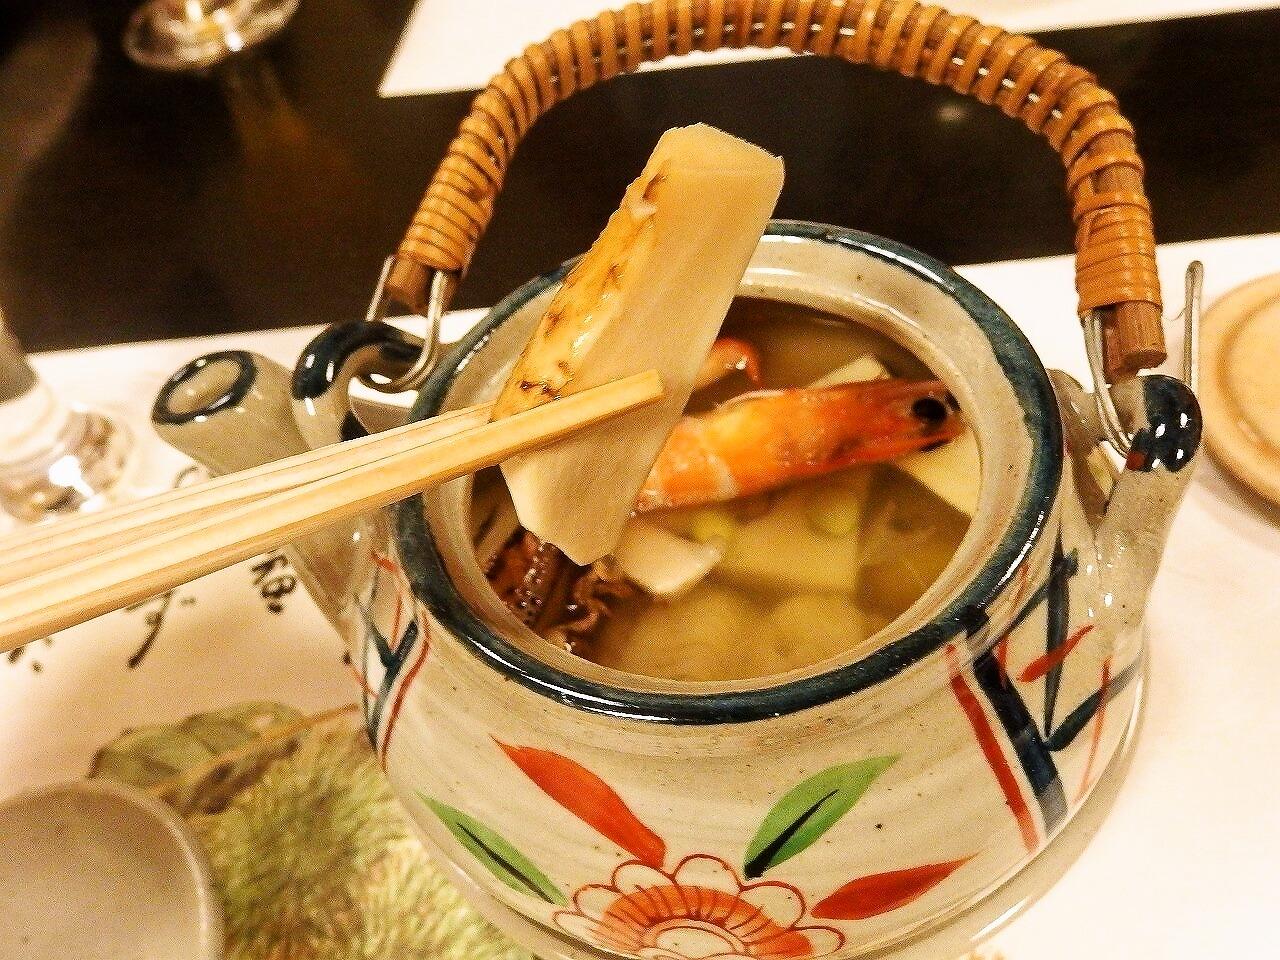 s-foodpic7231052.jpg